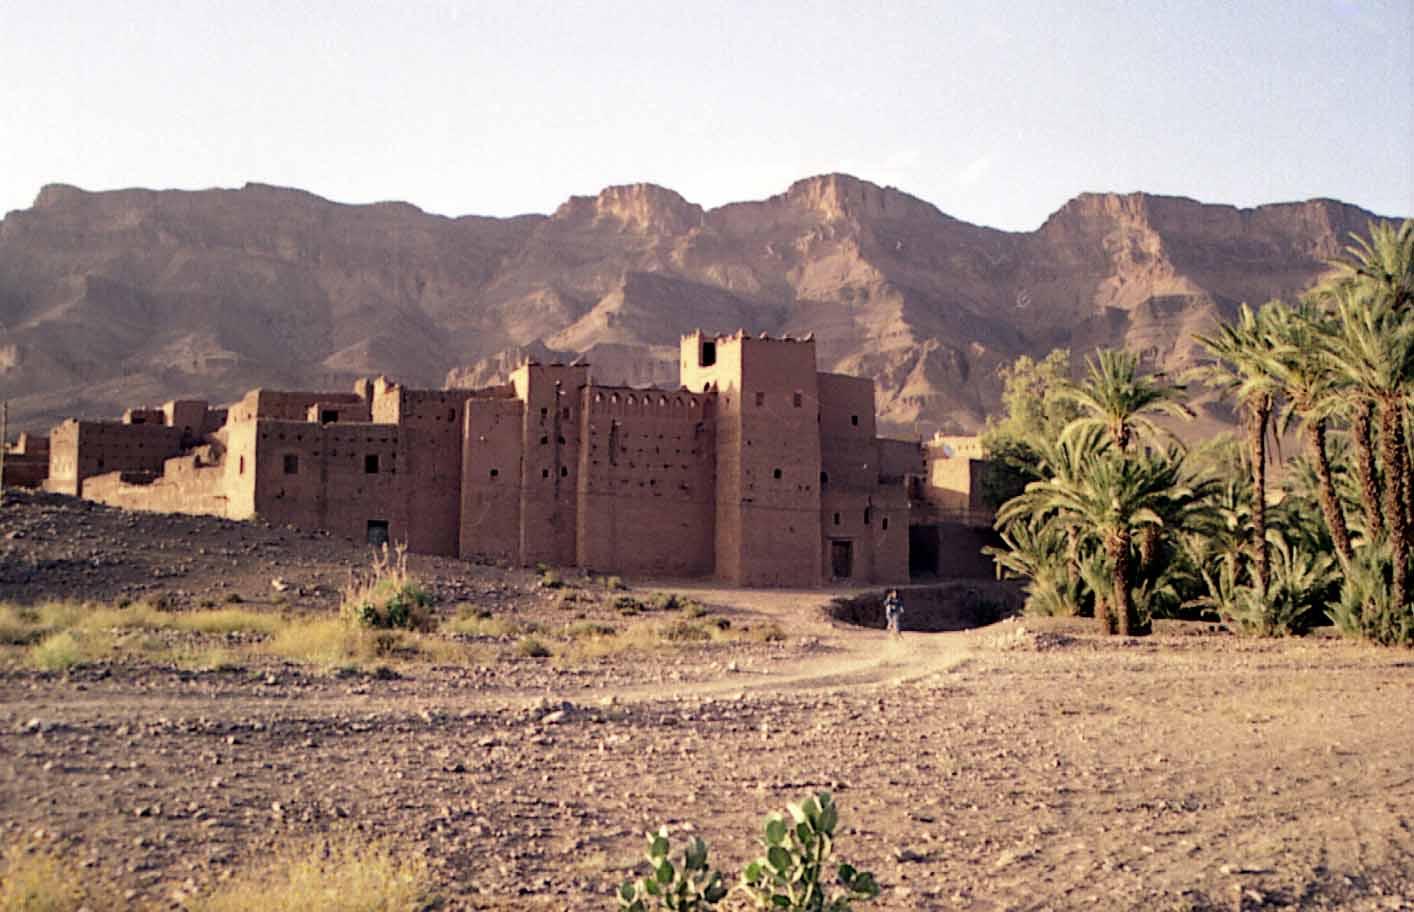 kasbah-aitmesoud-valley-de-draa-zagora-1492700417-1559038930